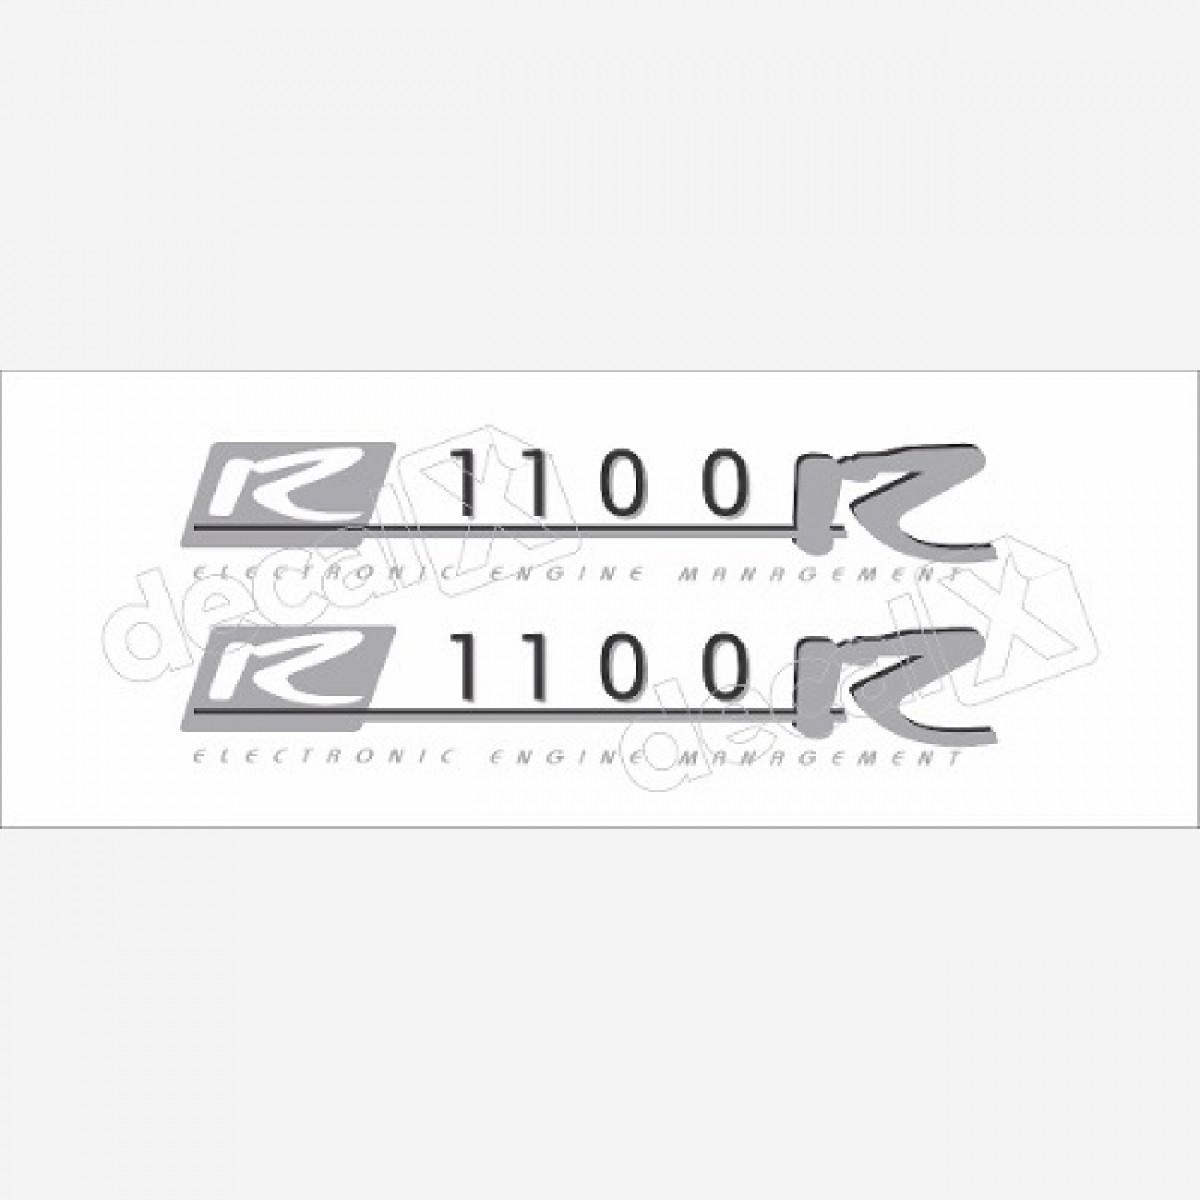 Emblema Adesivo Bmw R1100r Par Decalx